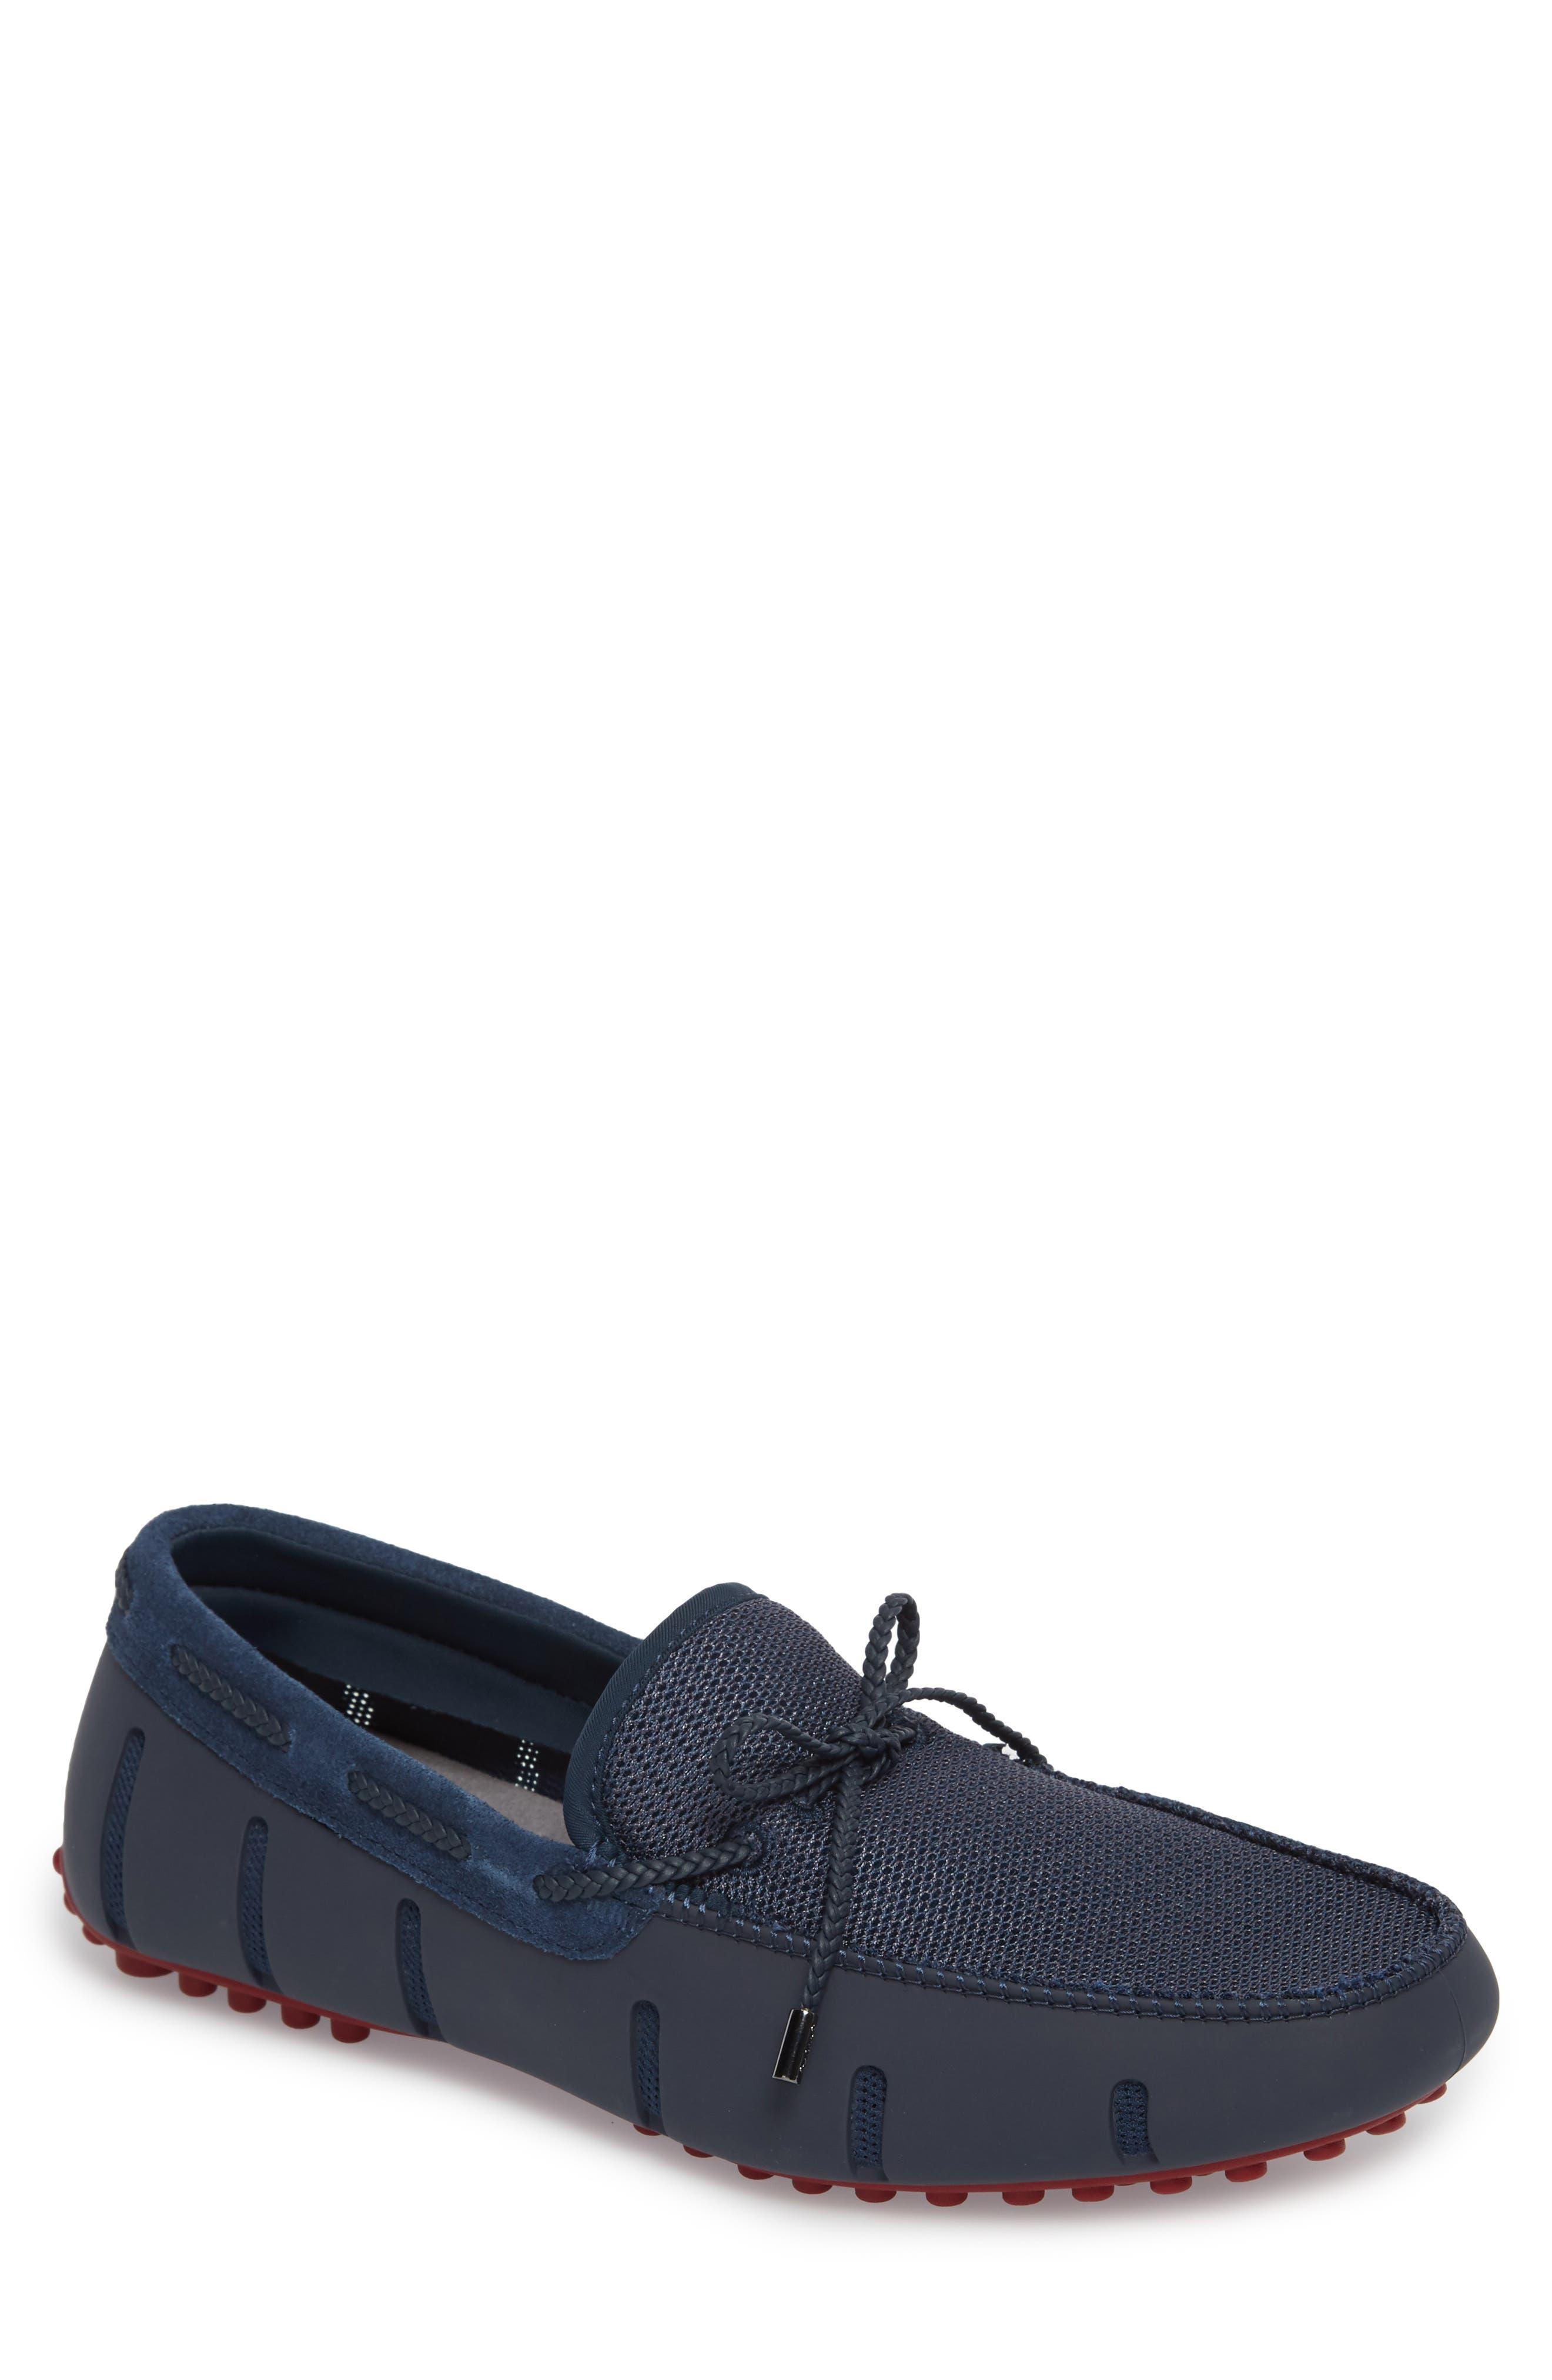 Driving Shoe,                         Main,                         color, 410